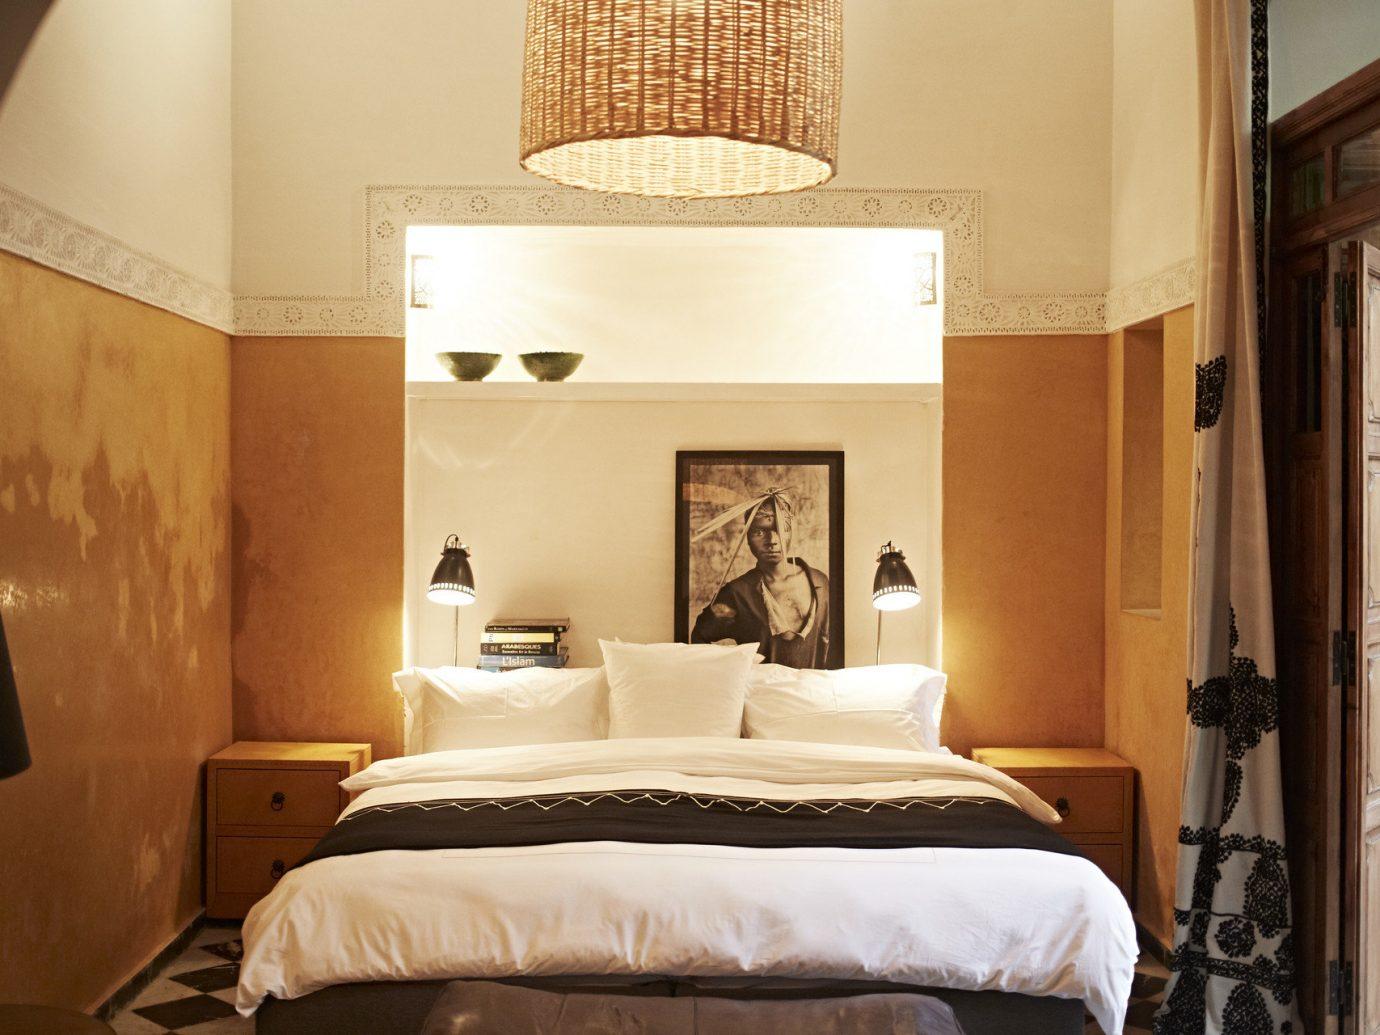 Arts + Culture Influencers + Tastemakers Marrakech Morocco Style + Design Travel Shop Trip Ideas wall bed indoor room property estate hotel Bedroom Suite interior design home floor cottage Villa mansion